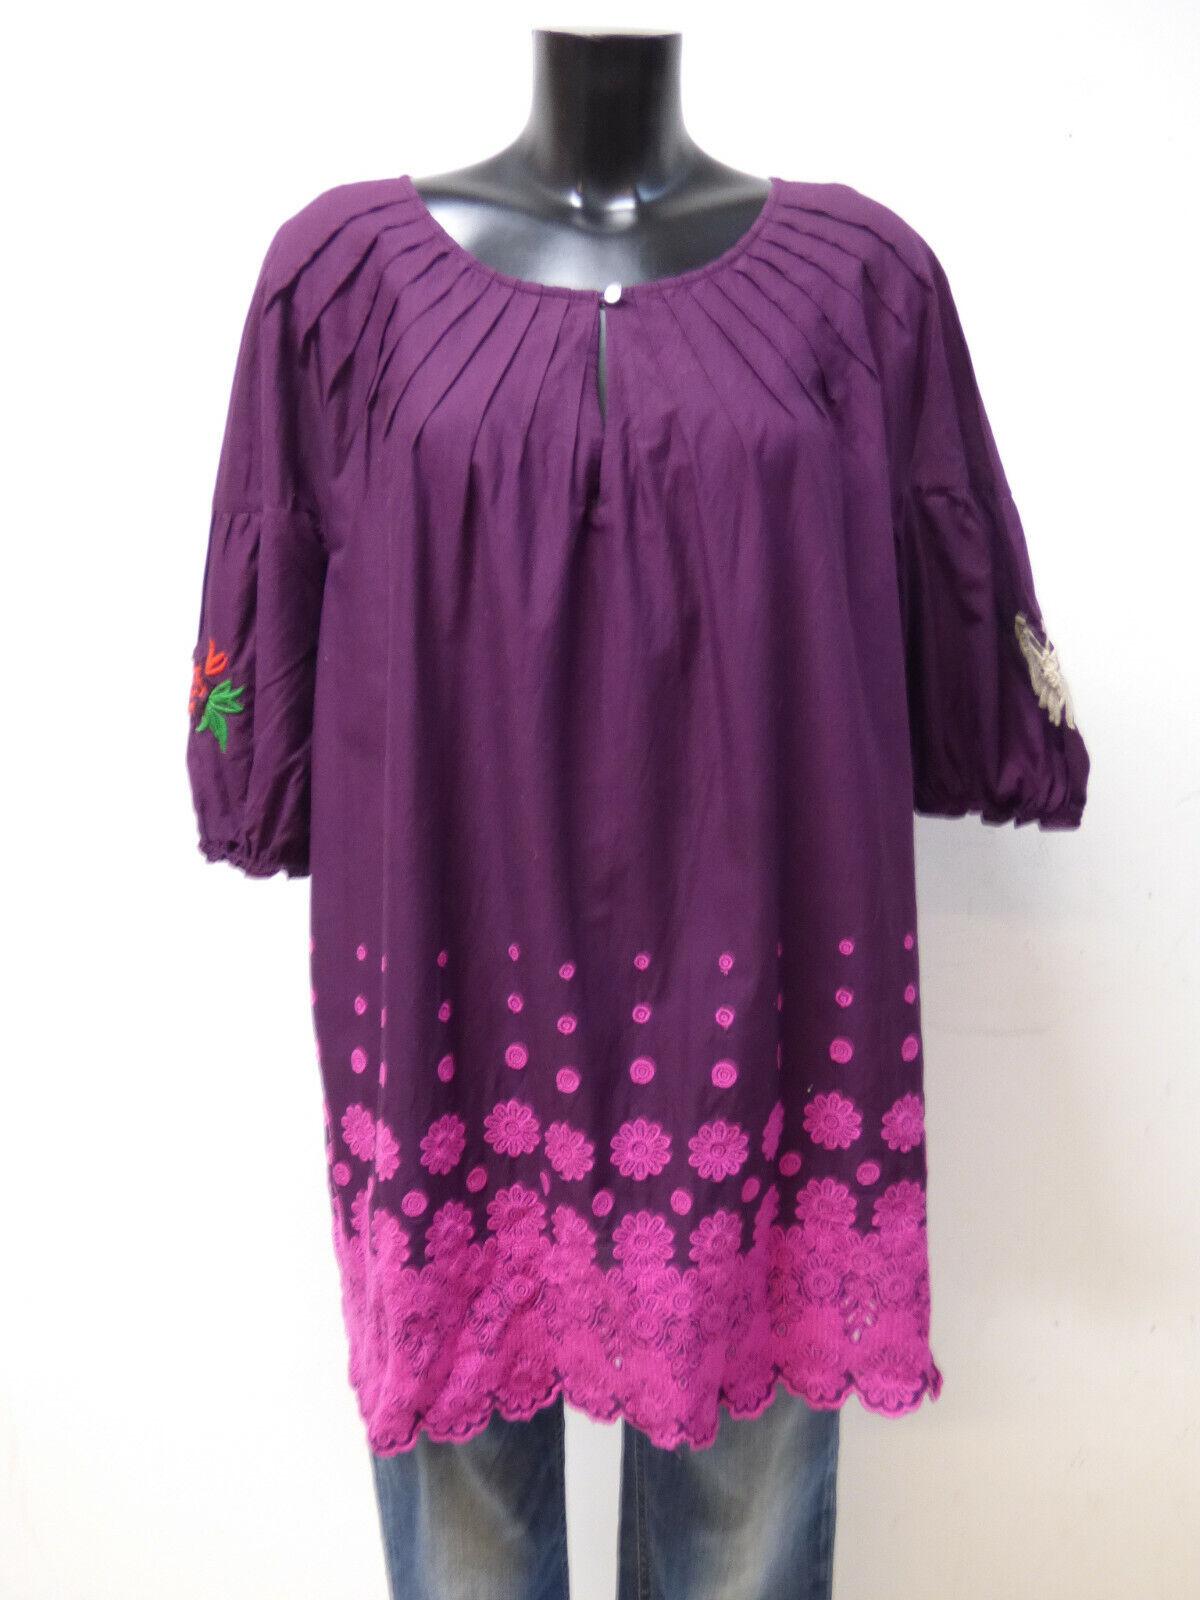 ODD MOLLY tunique haut T L - 3 FR violet foncé avec motif + Article neuf. (Q 2908)